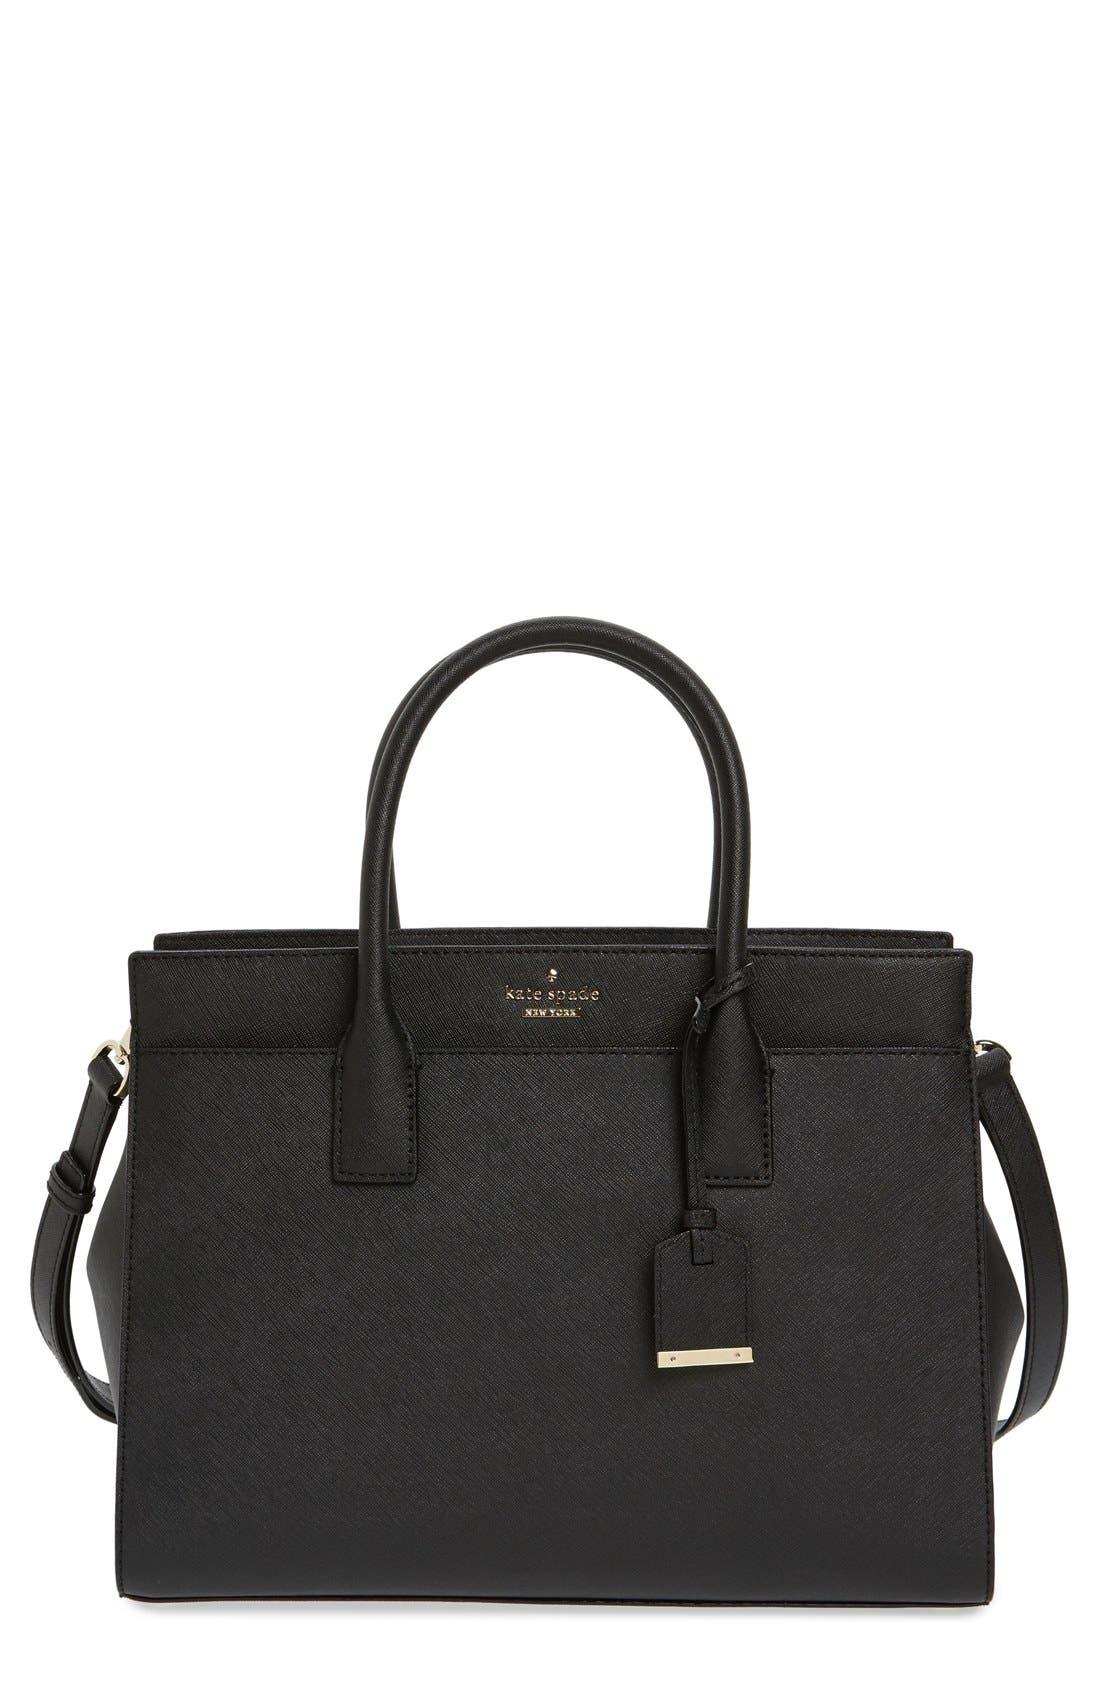 cameron street - candace leather satchel,                         Main,                         color, BLACK